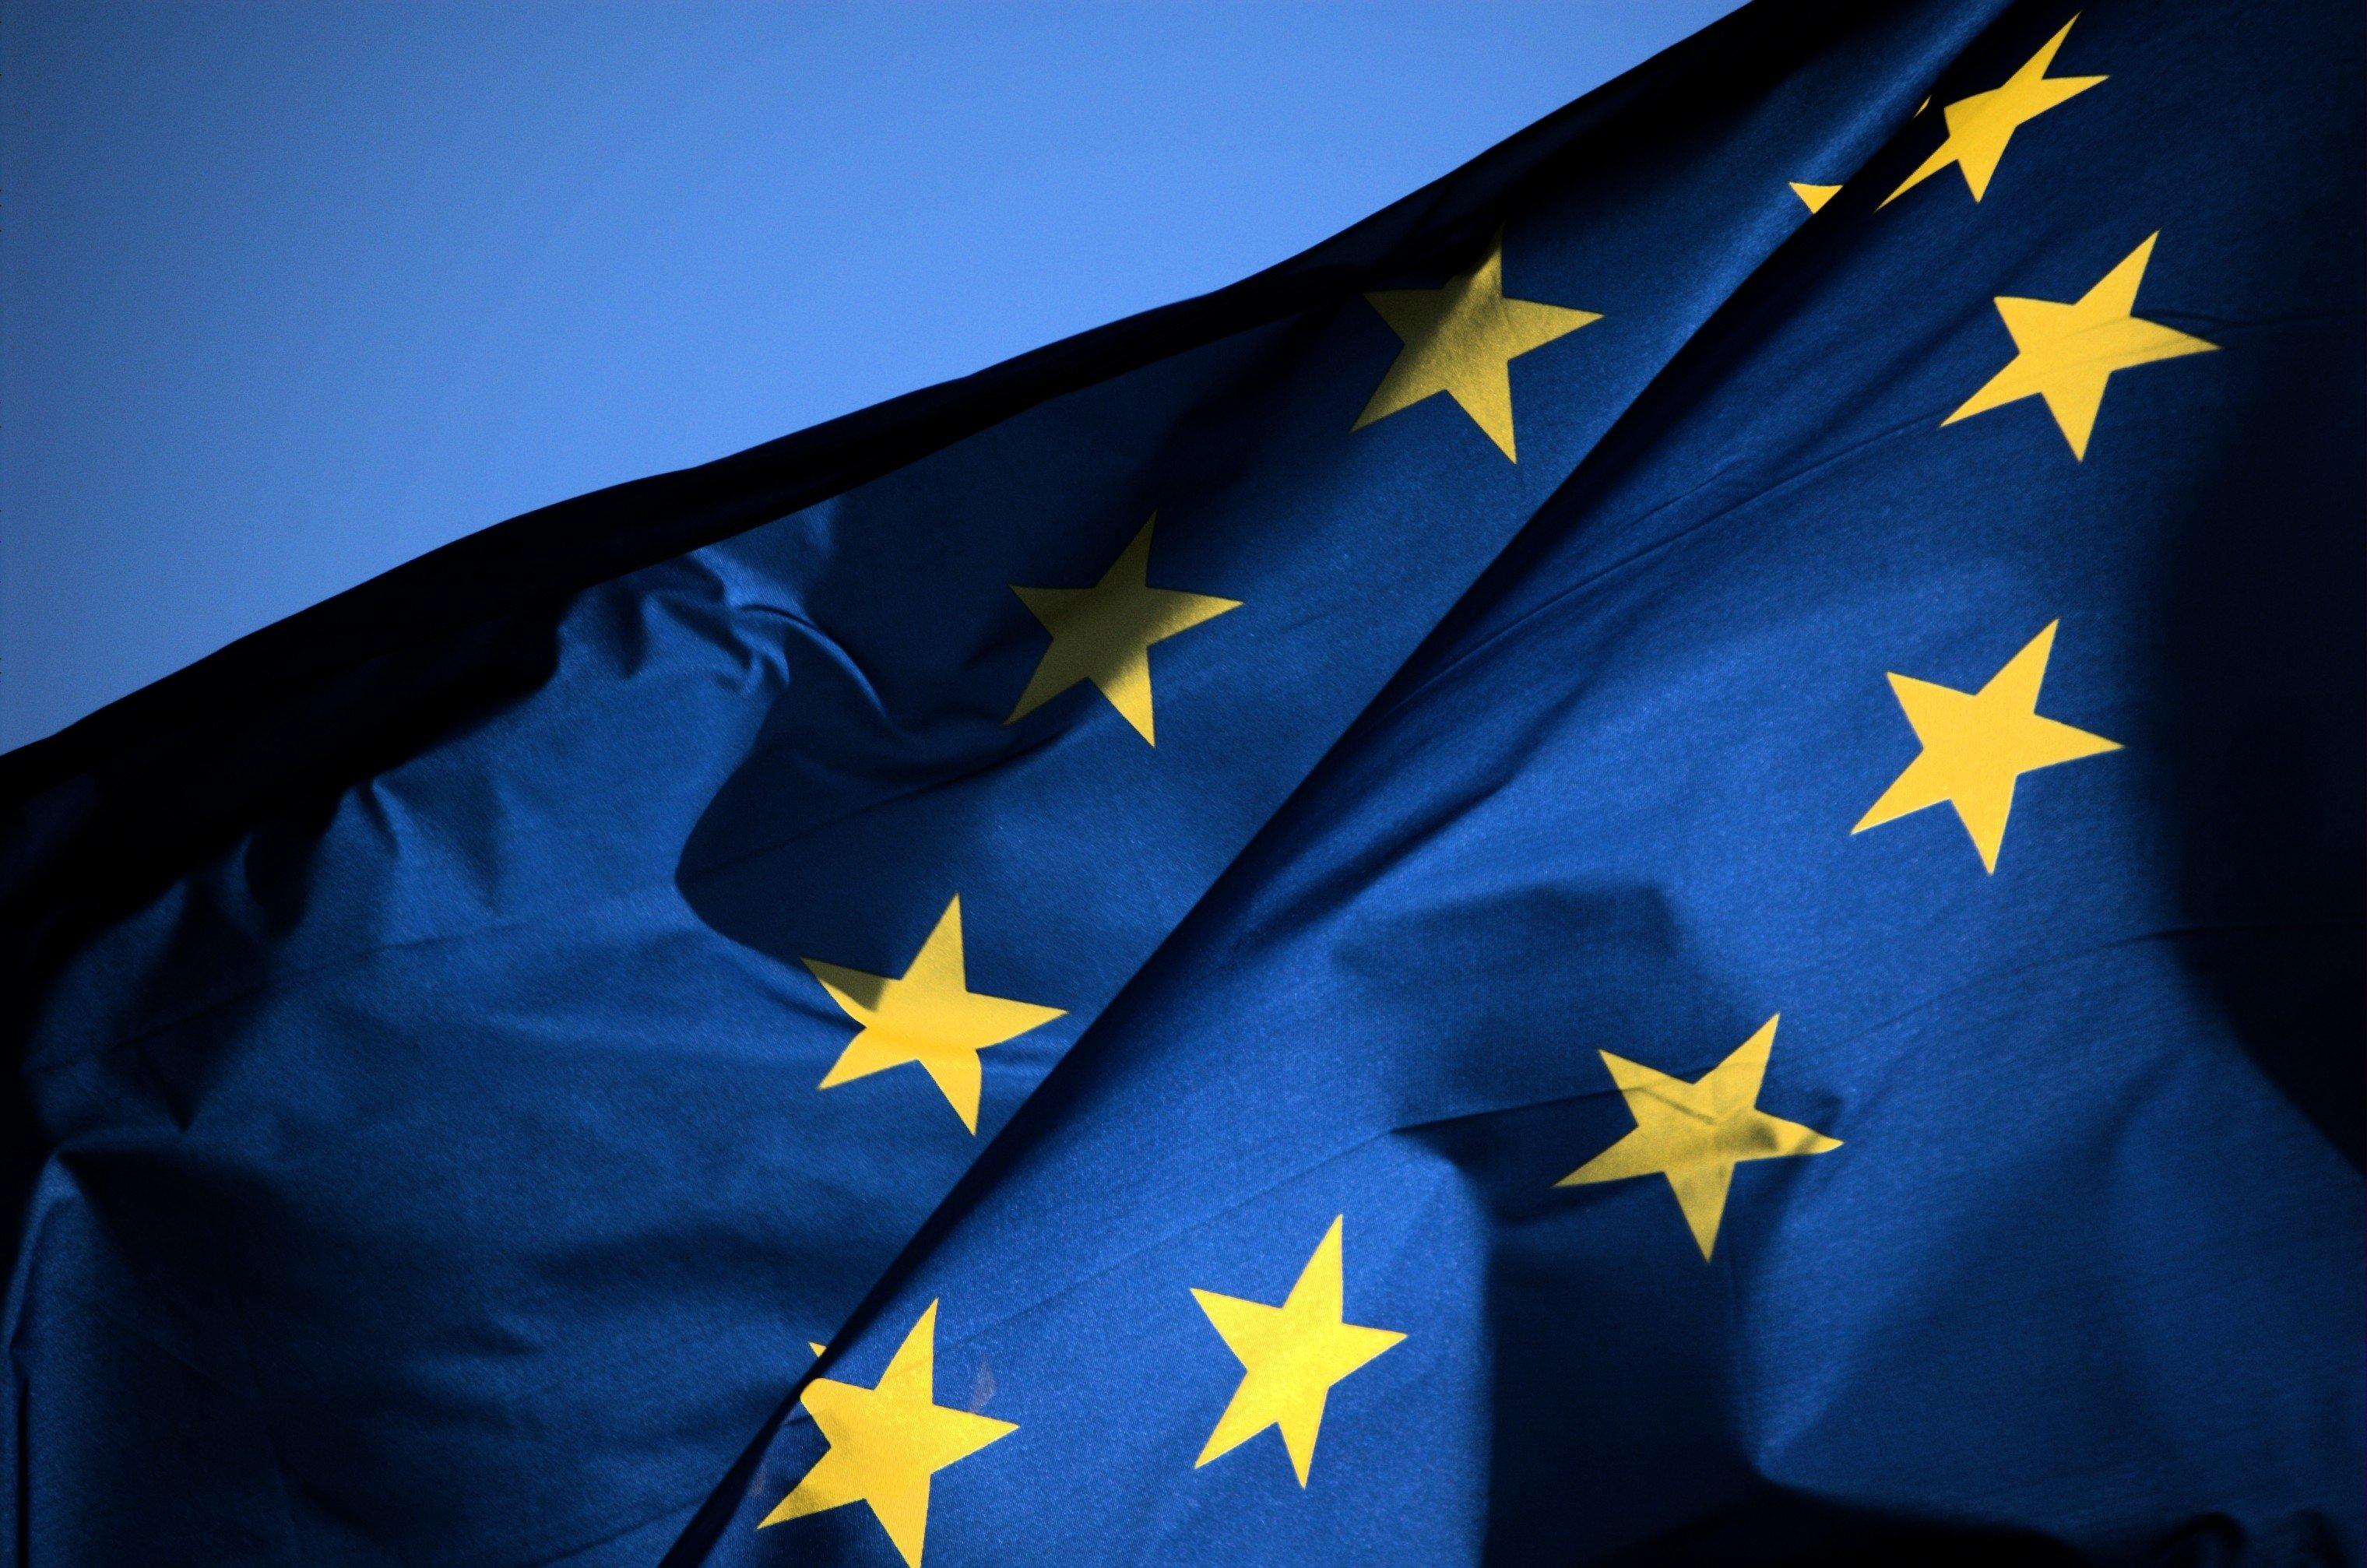 REACH forordningen er administreret af det europæiske kemikalieagentur, ECHA